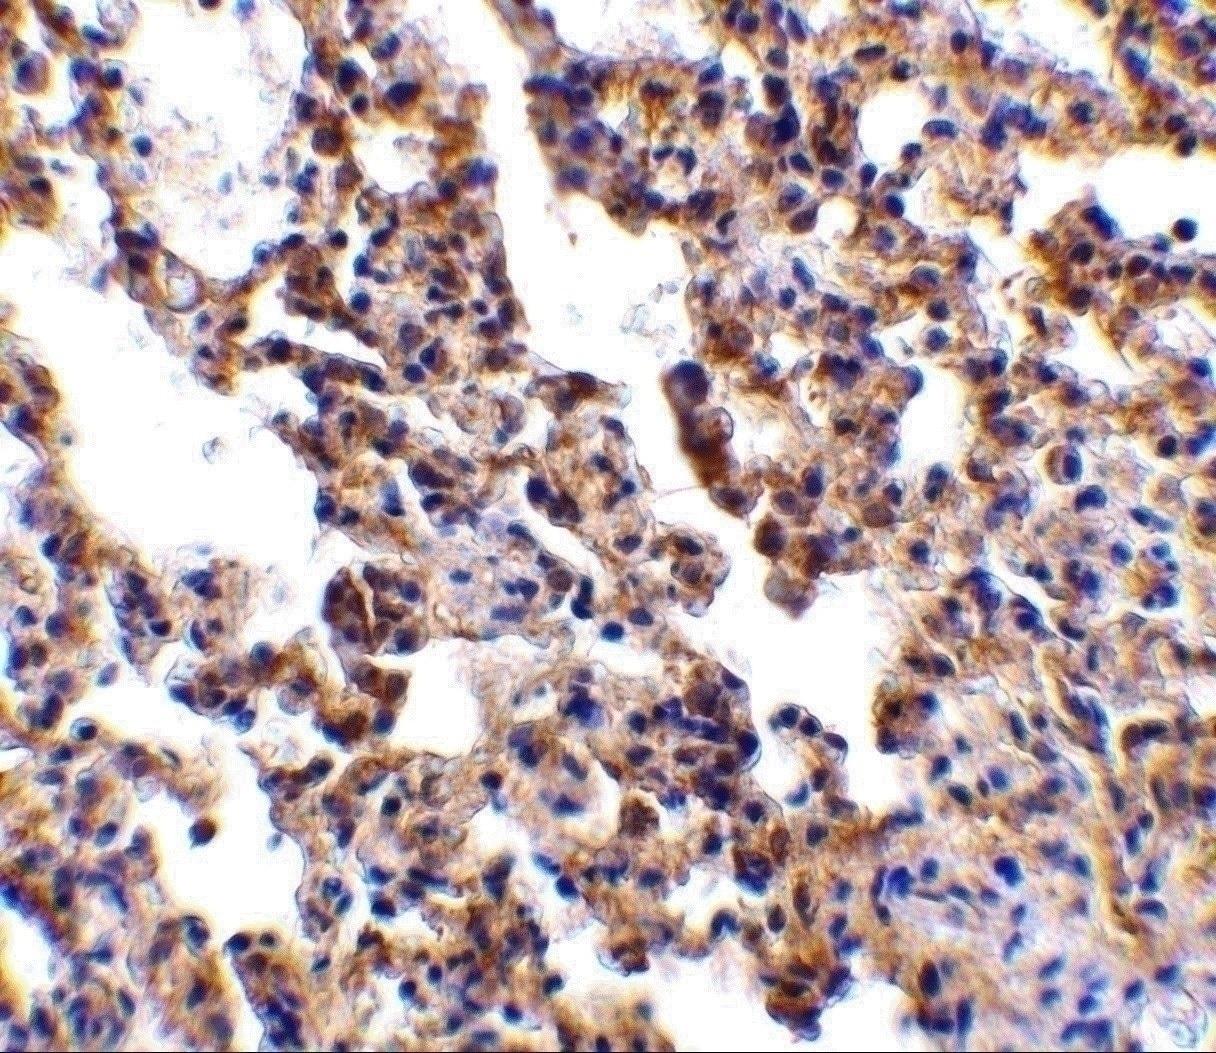 Immunohistochemistry (Formalin/PFA-fixed paraffin-embedded sections) - Anti-IL-21R antibody (ab5980)